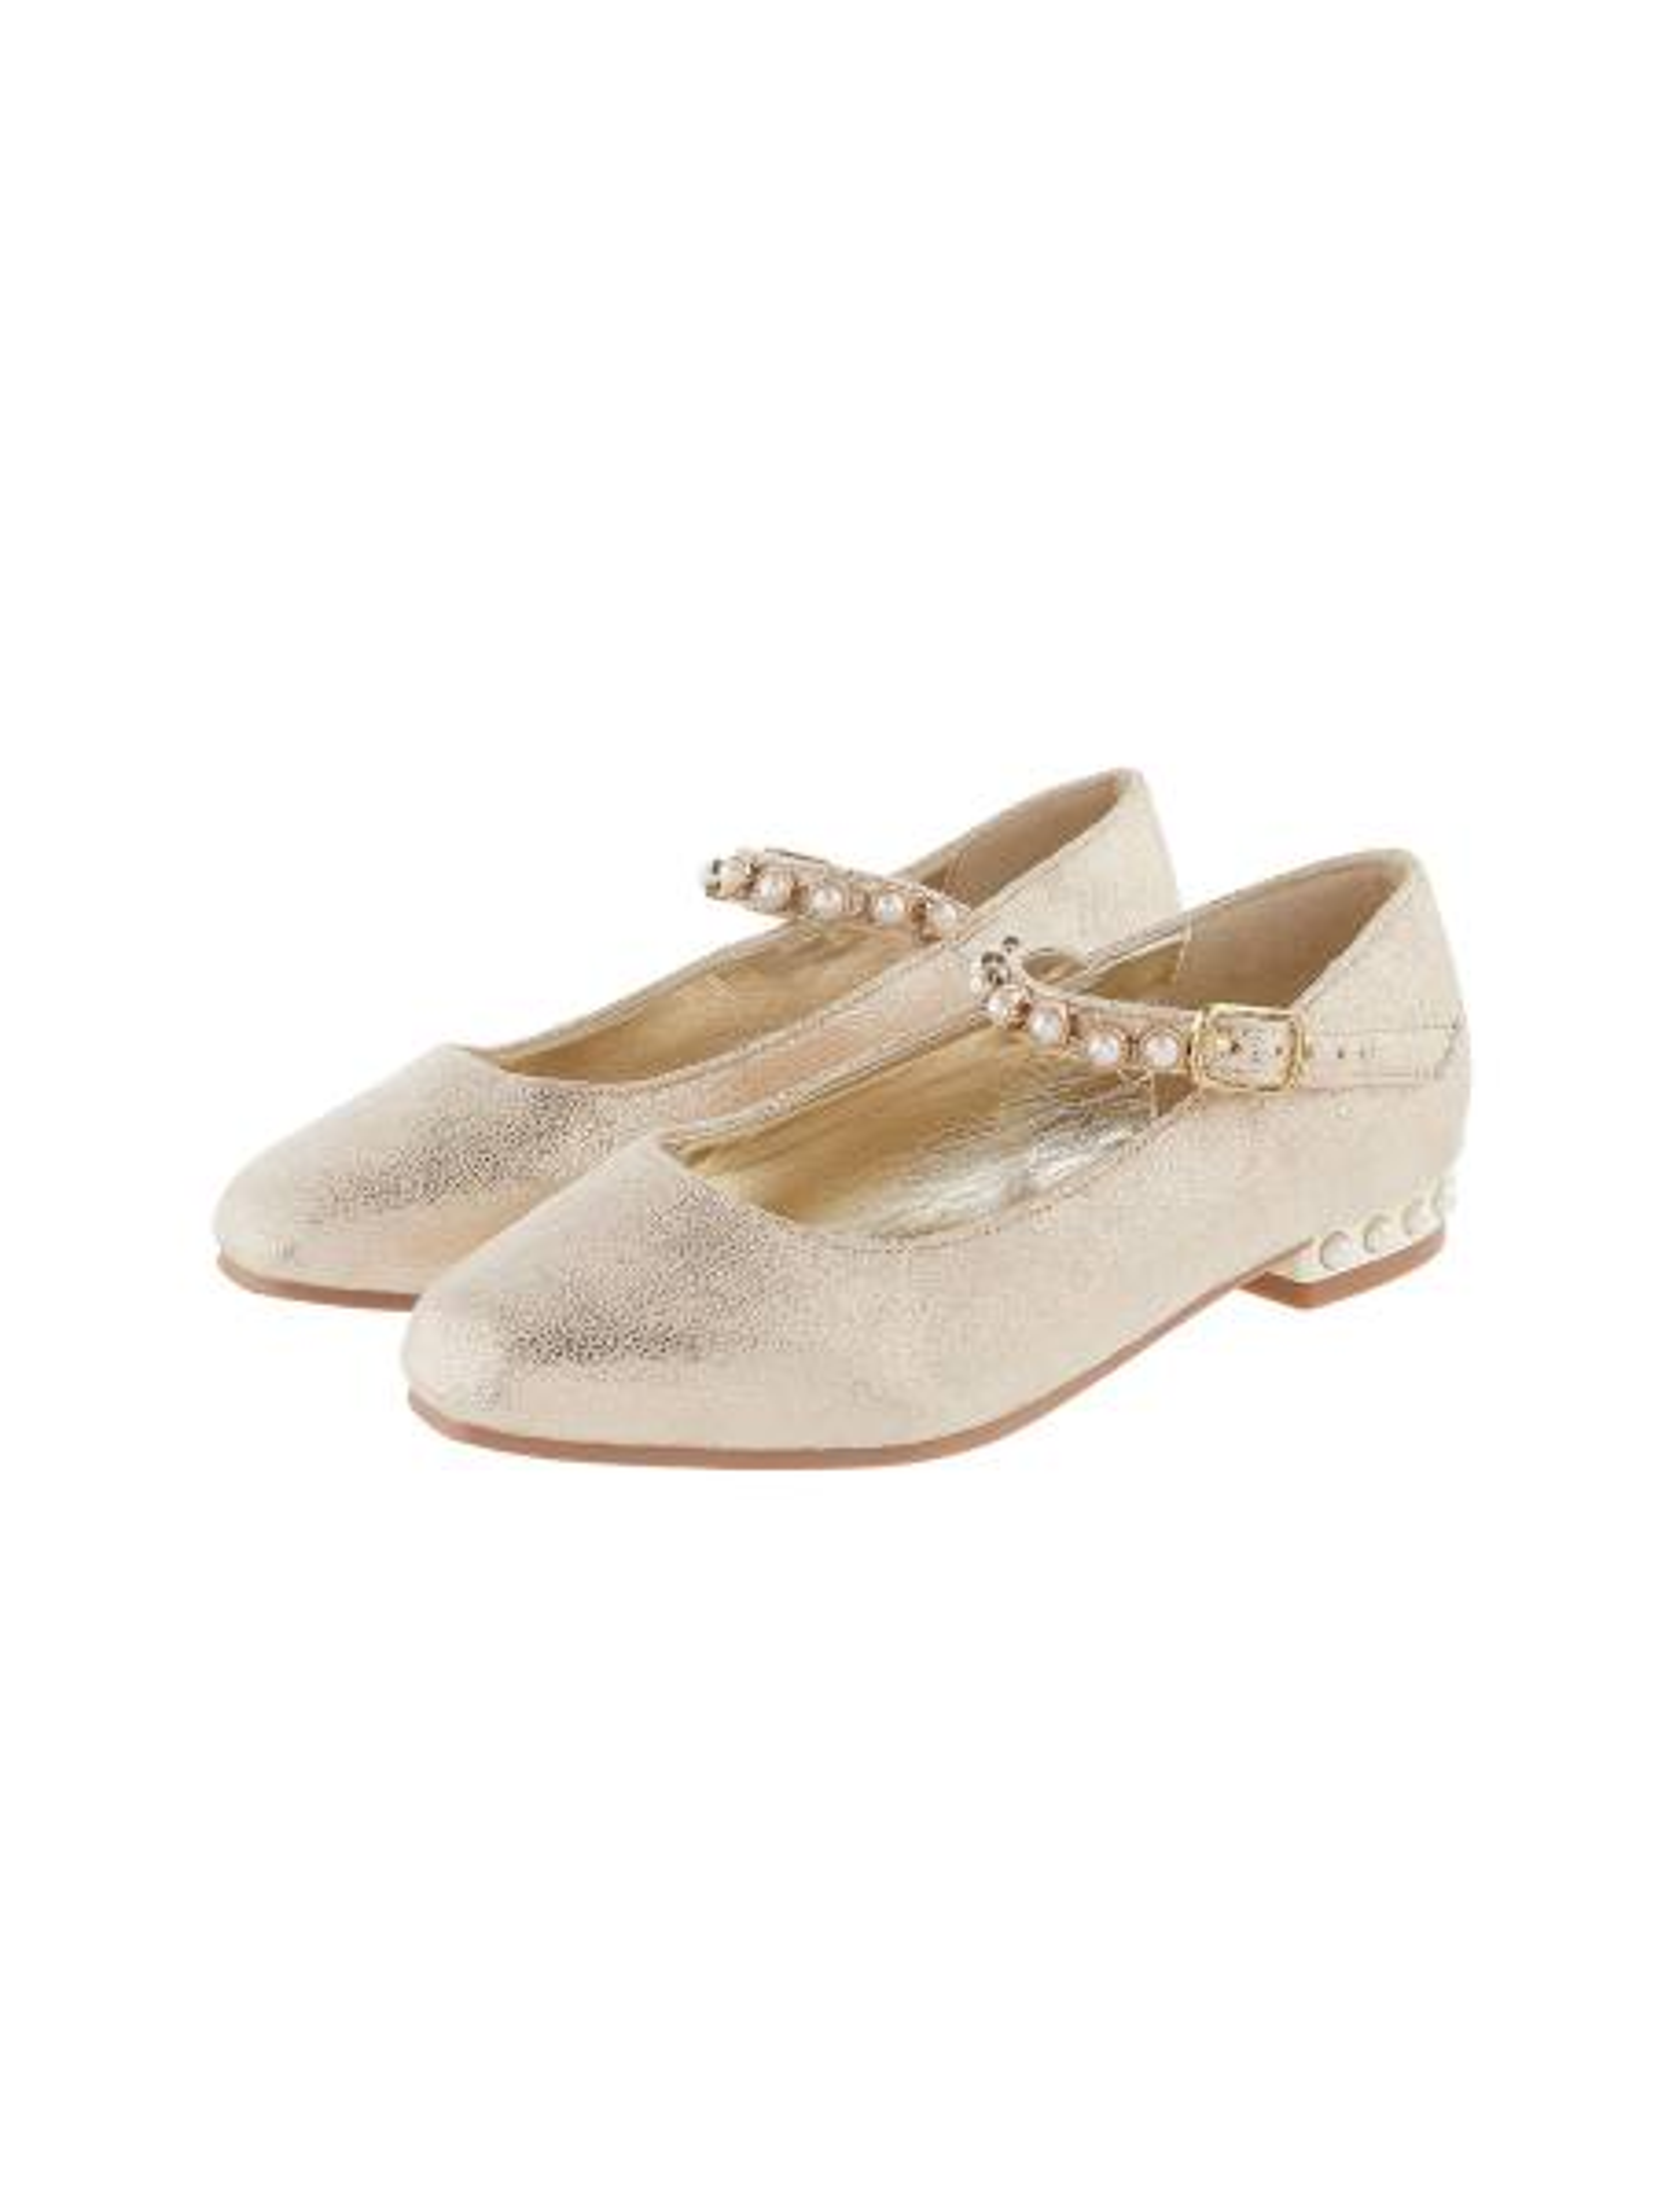 کفش مهمانی بندی دخترانه - طلايي  - 3